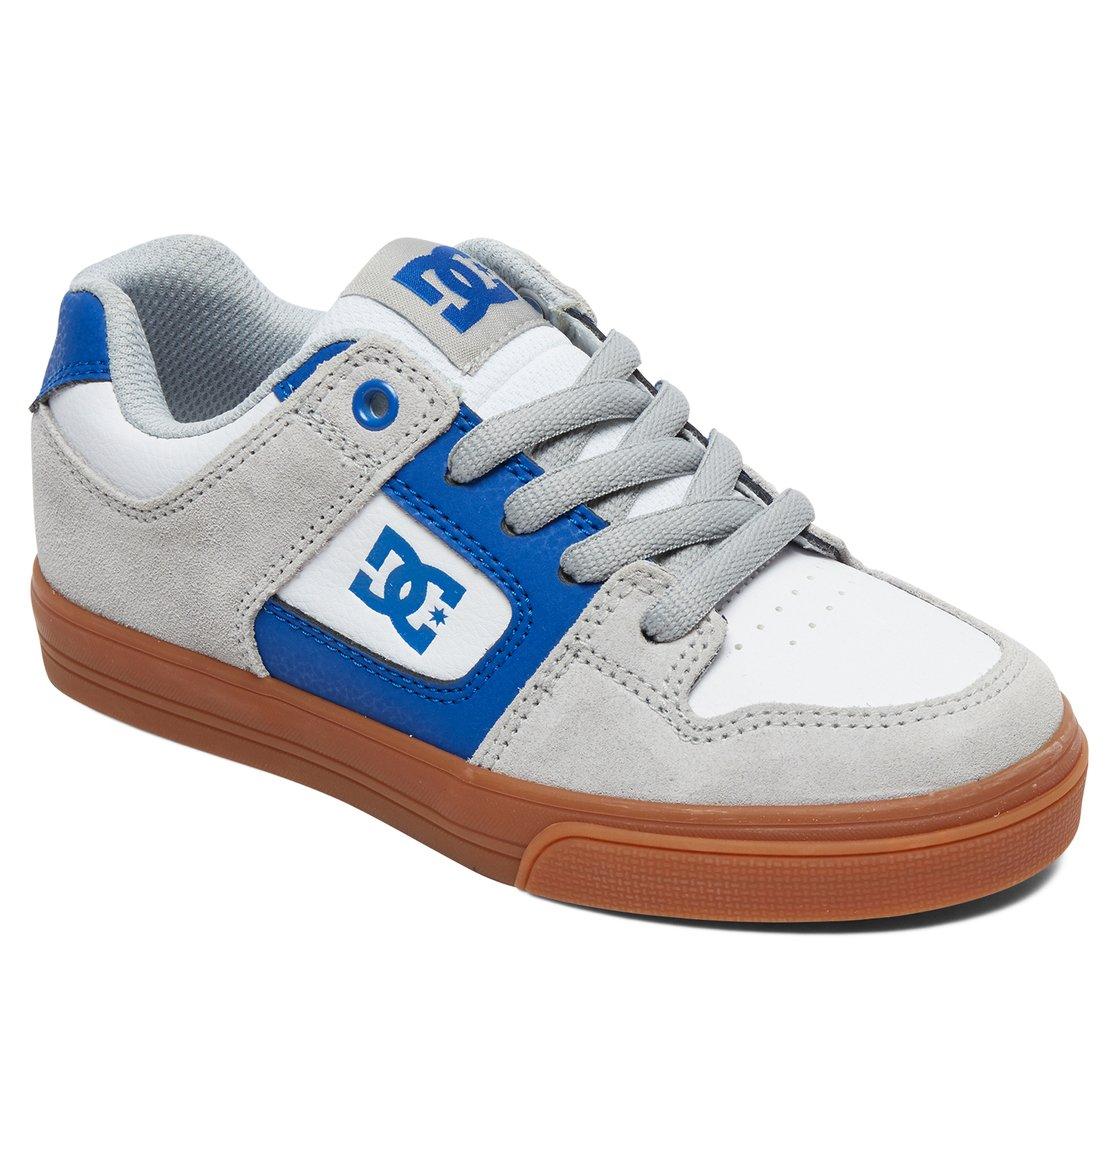 7e8adf63a DC-Shoes-Pure-Zapatillas-para-Ninos-ADBS300267 miniatura 18